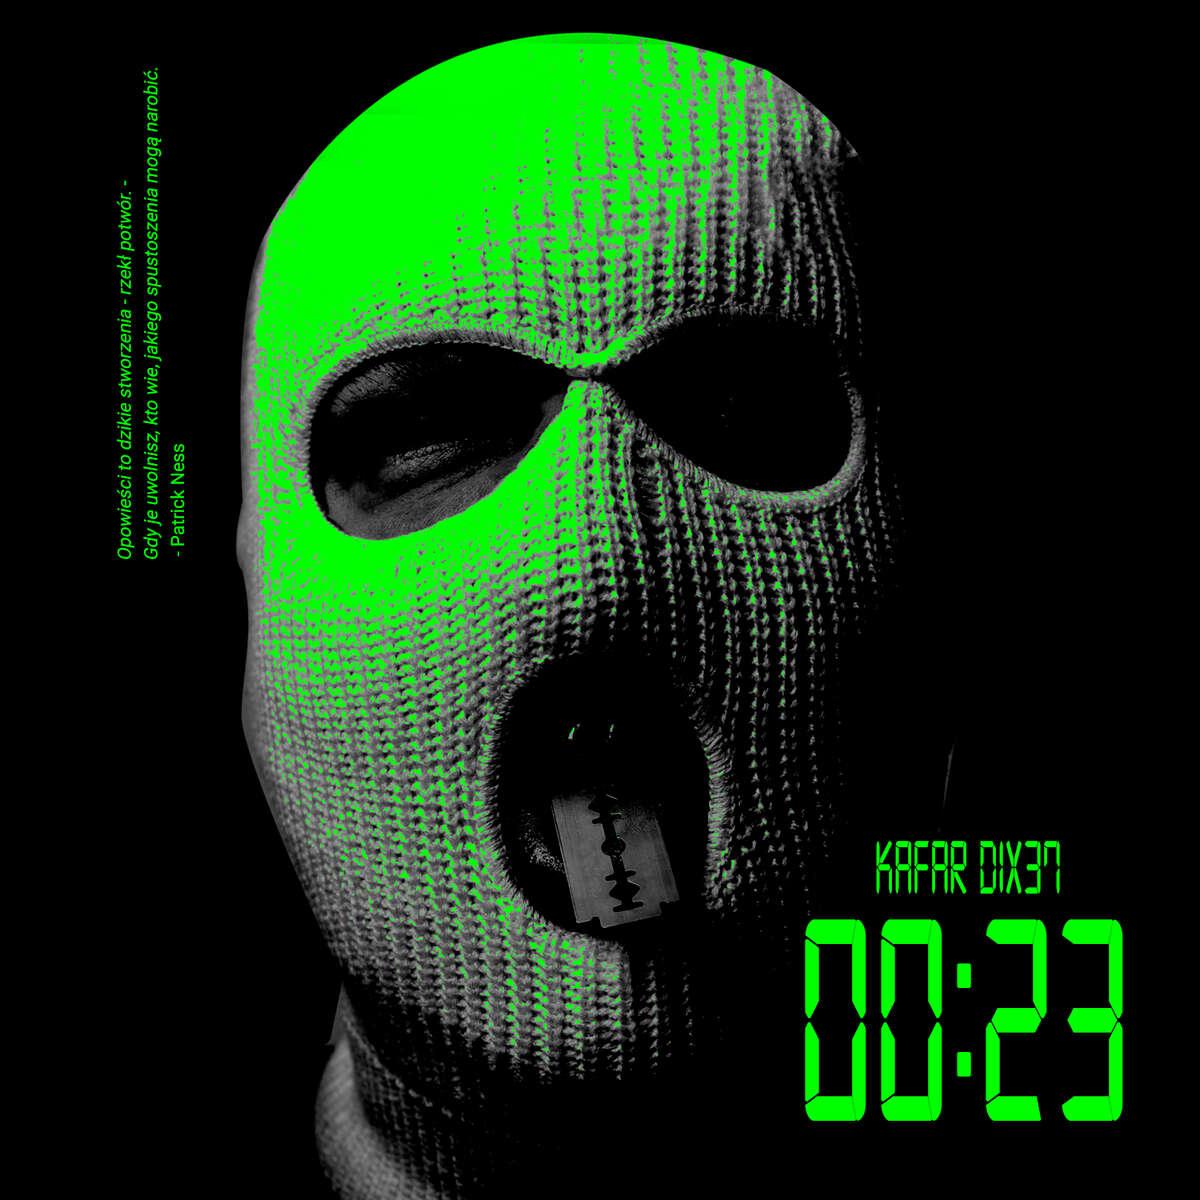 PŁYTA CD KAFAR DIX37 23 MINUTY PO PÓŁNOCY